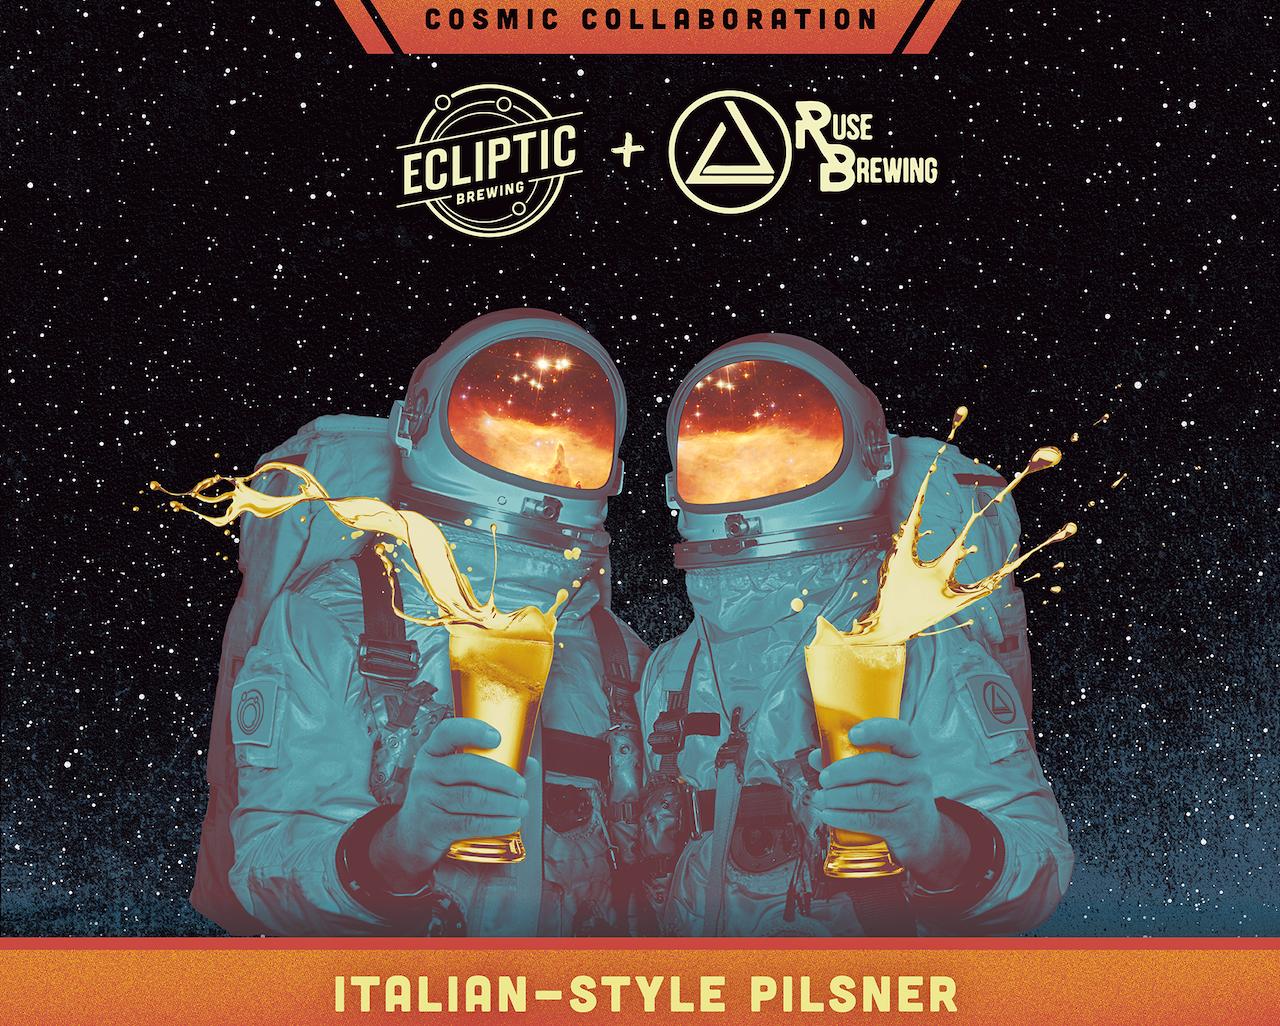 Ecliptic Ruse Italian Style Pilsner